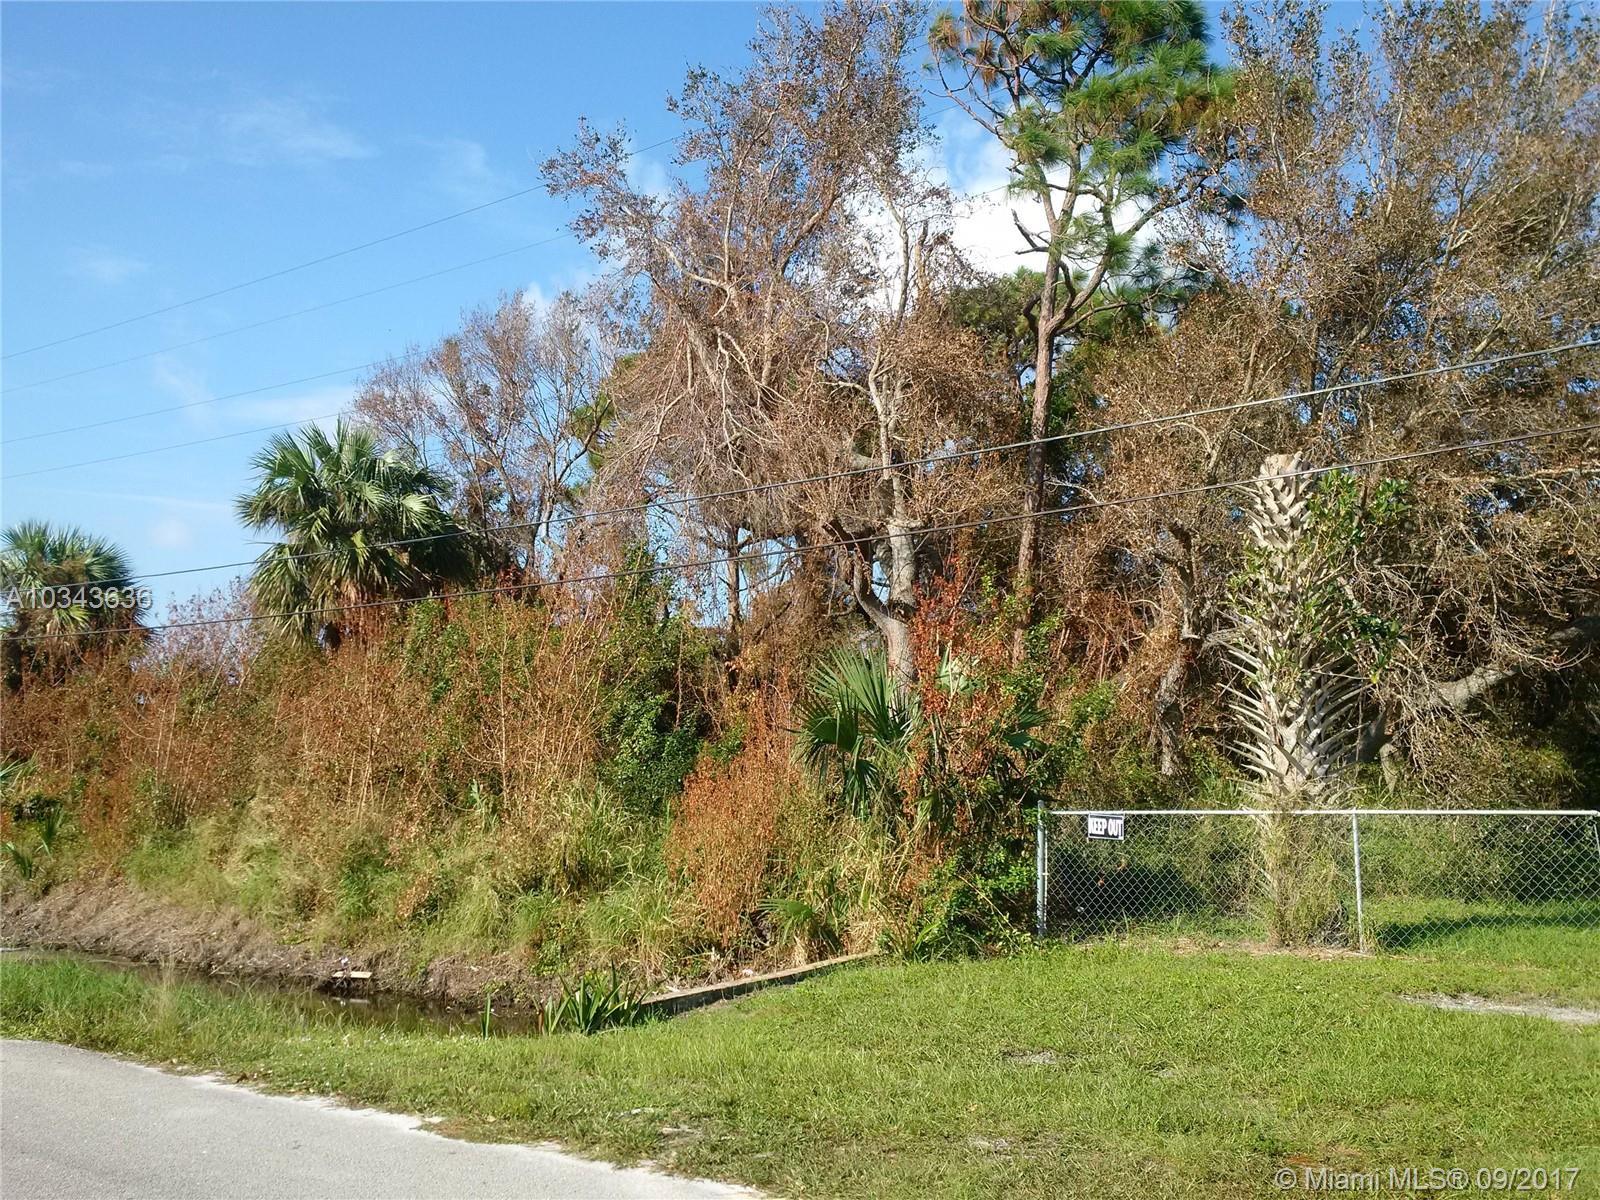 17 North Cswy, Fort Pierce, FL 34946